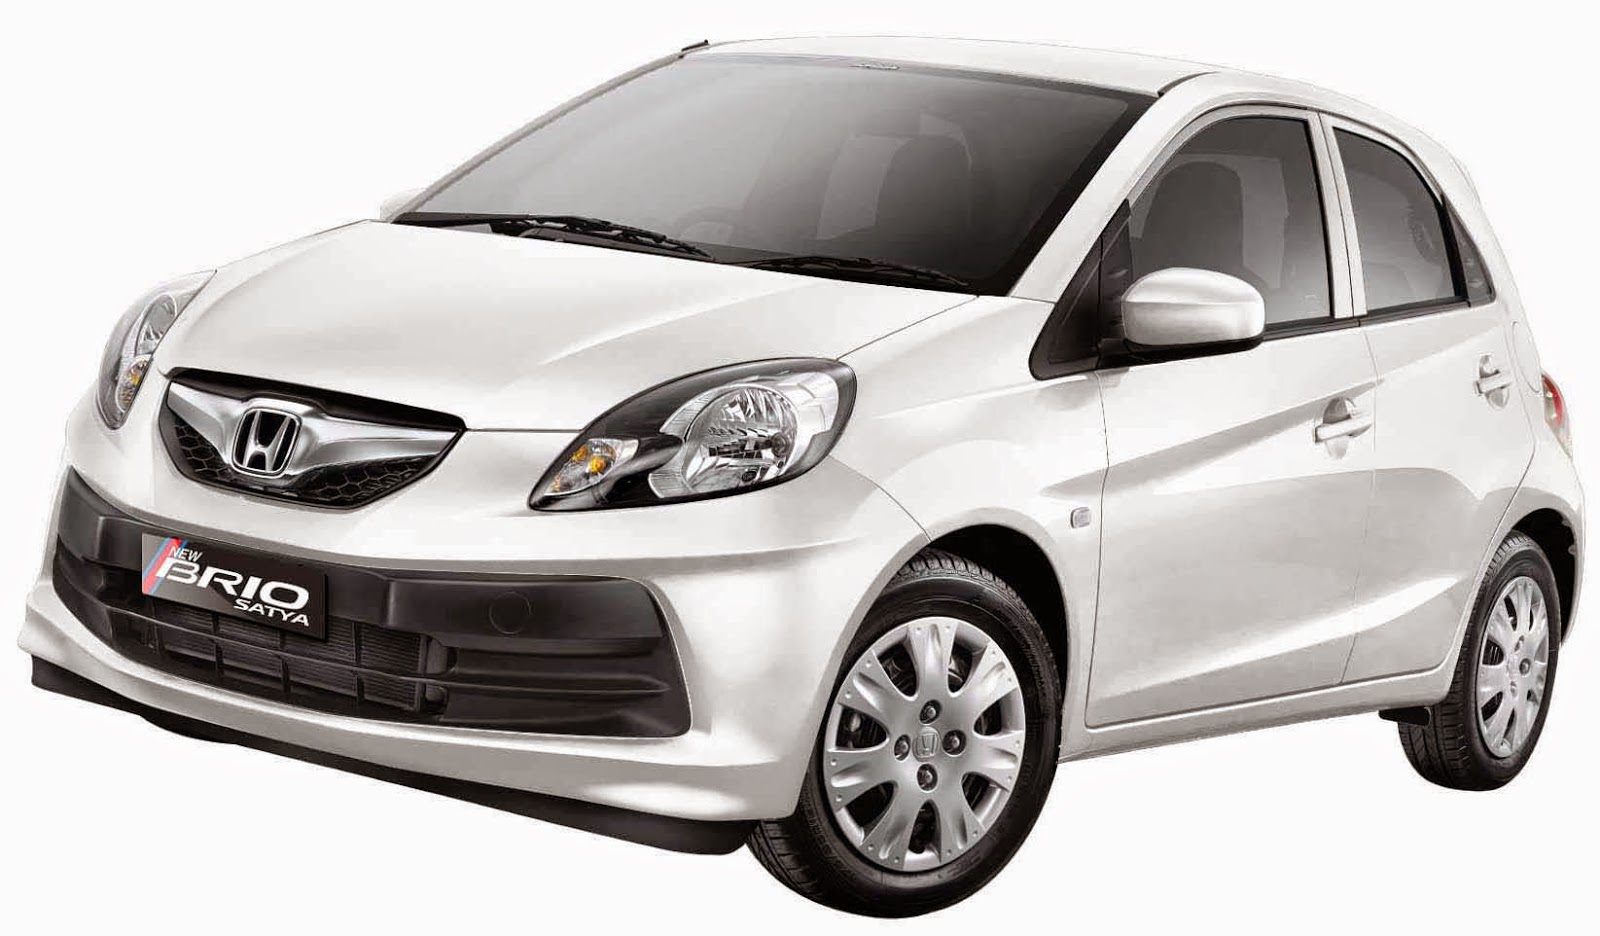 Spesifikasi dan Harga Honda Brio Satya di Tahun 2020 Inkuiri